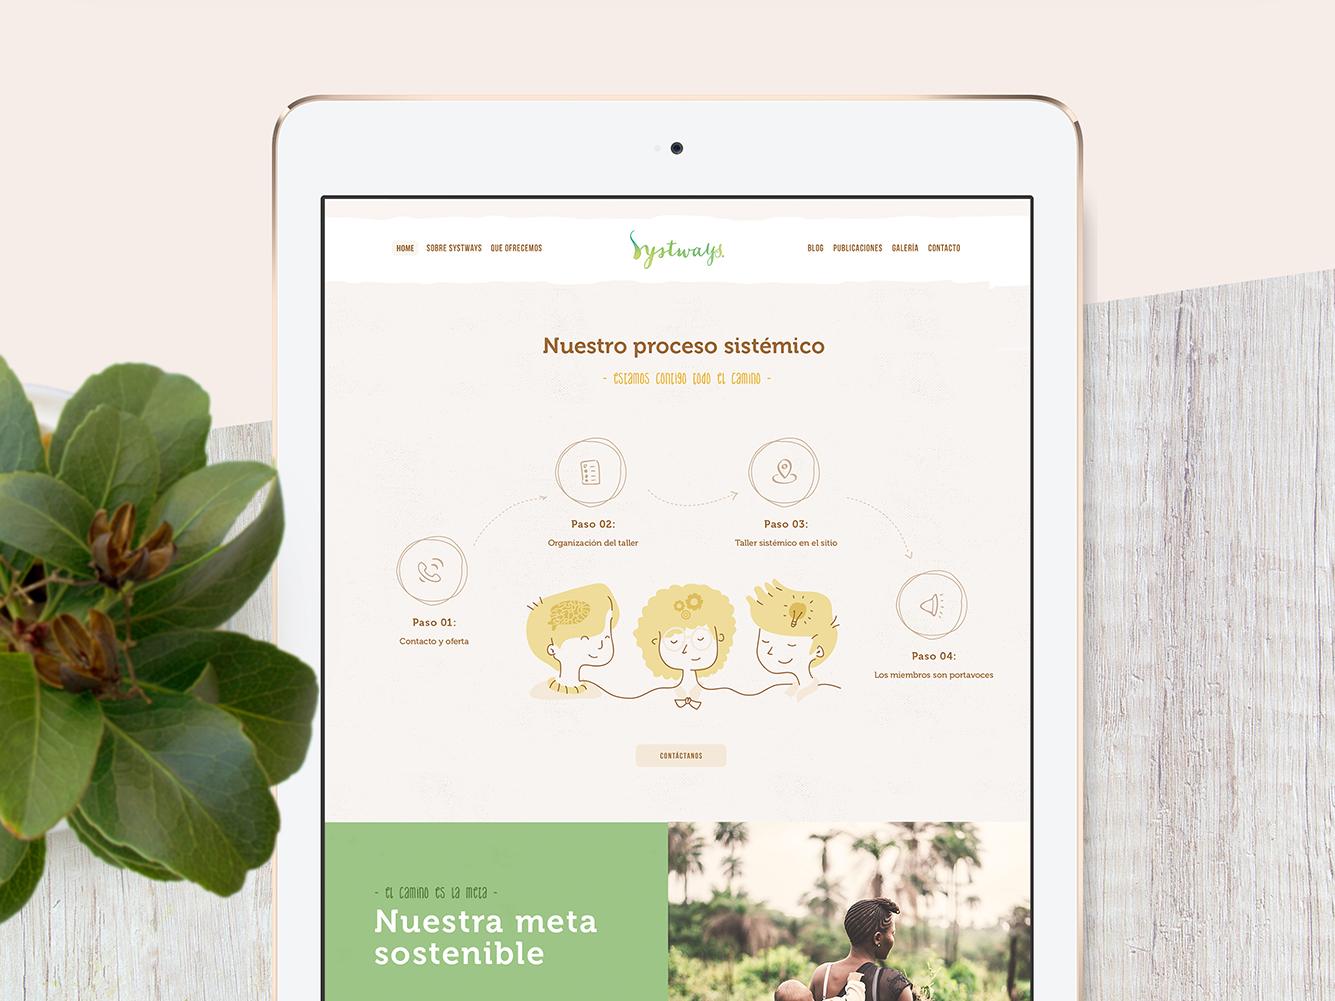 Systways nature environment help ngo earth illustration ui web design